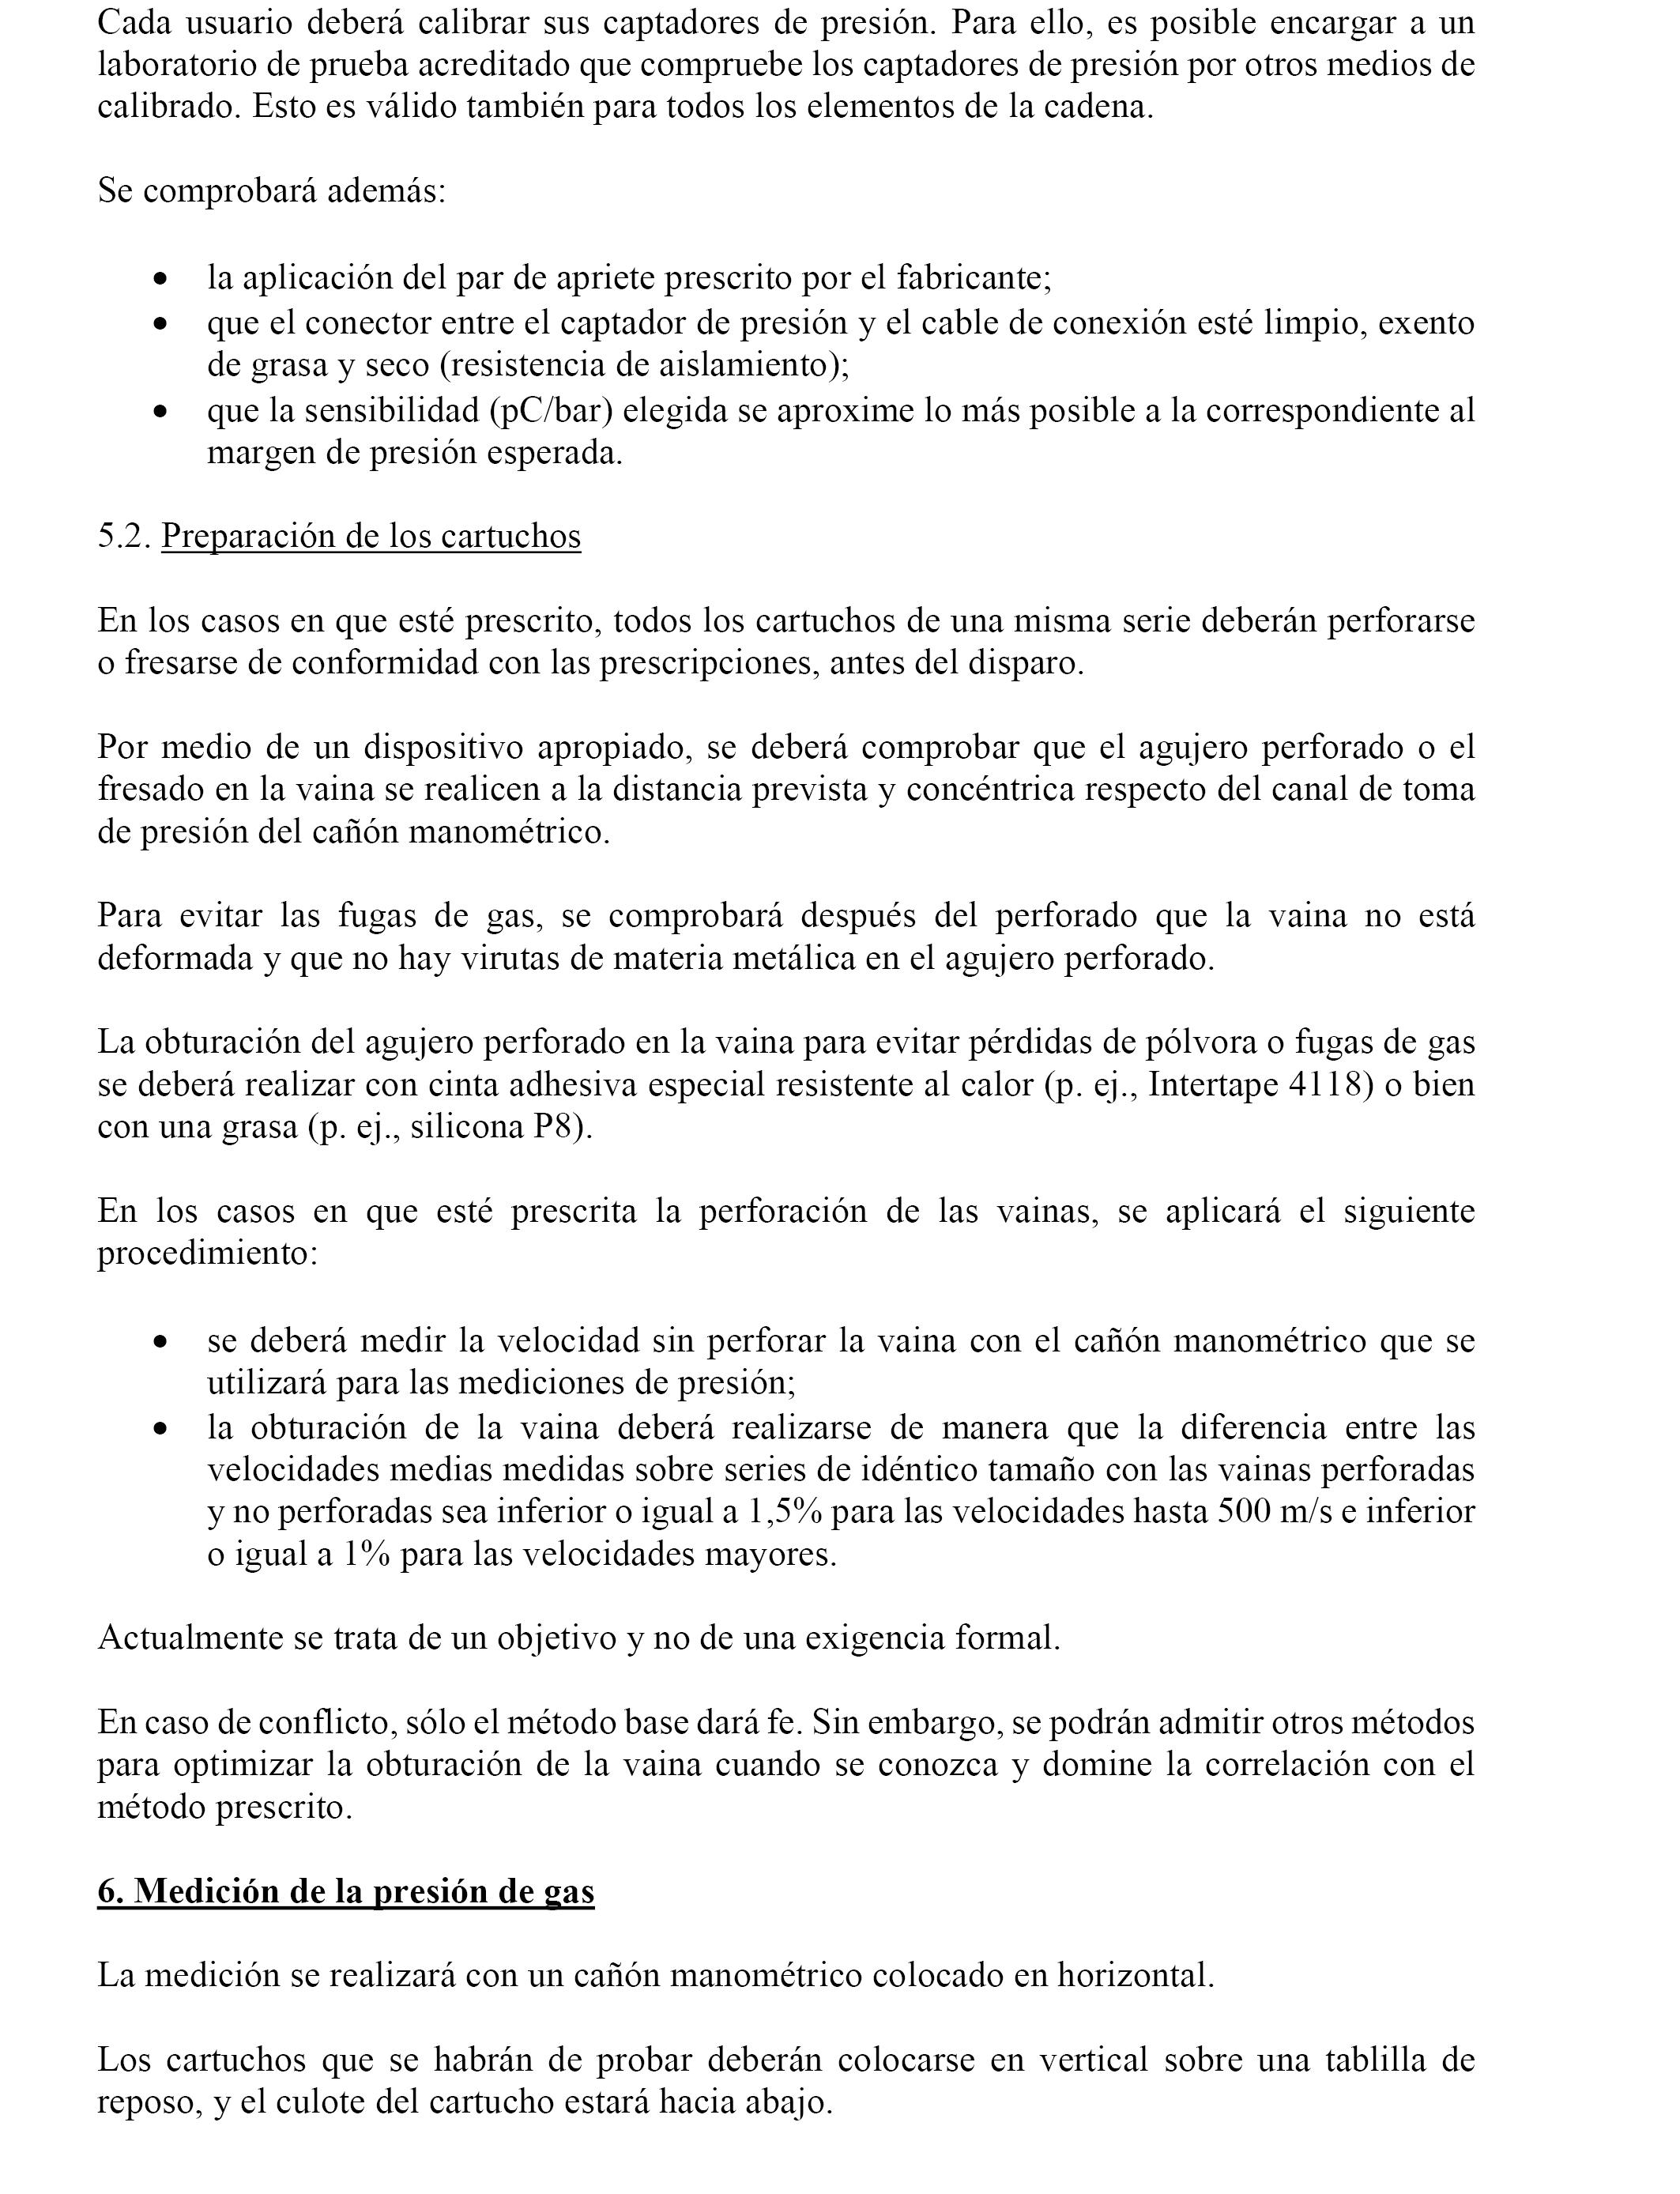 BOE.es - Documento BOE-A-2017-13359